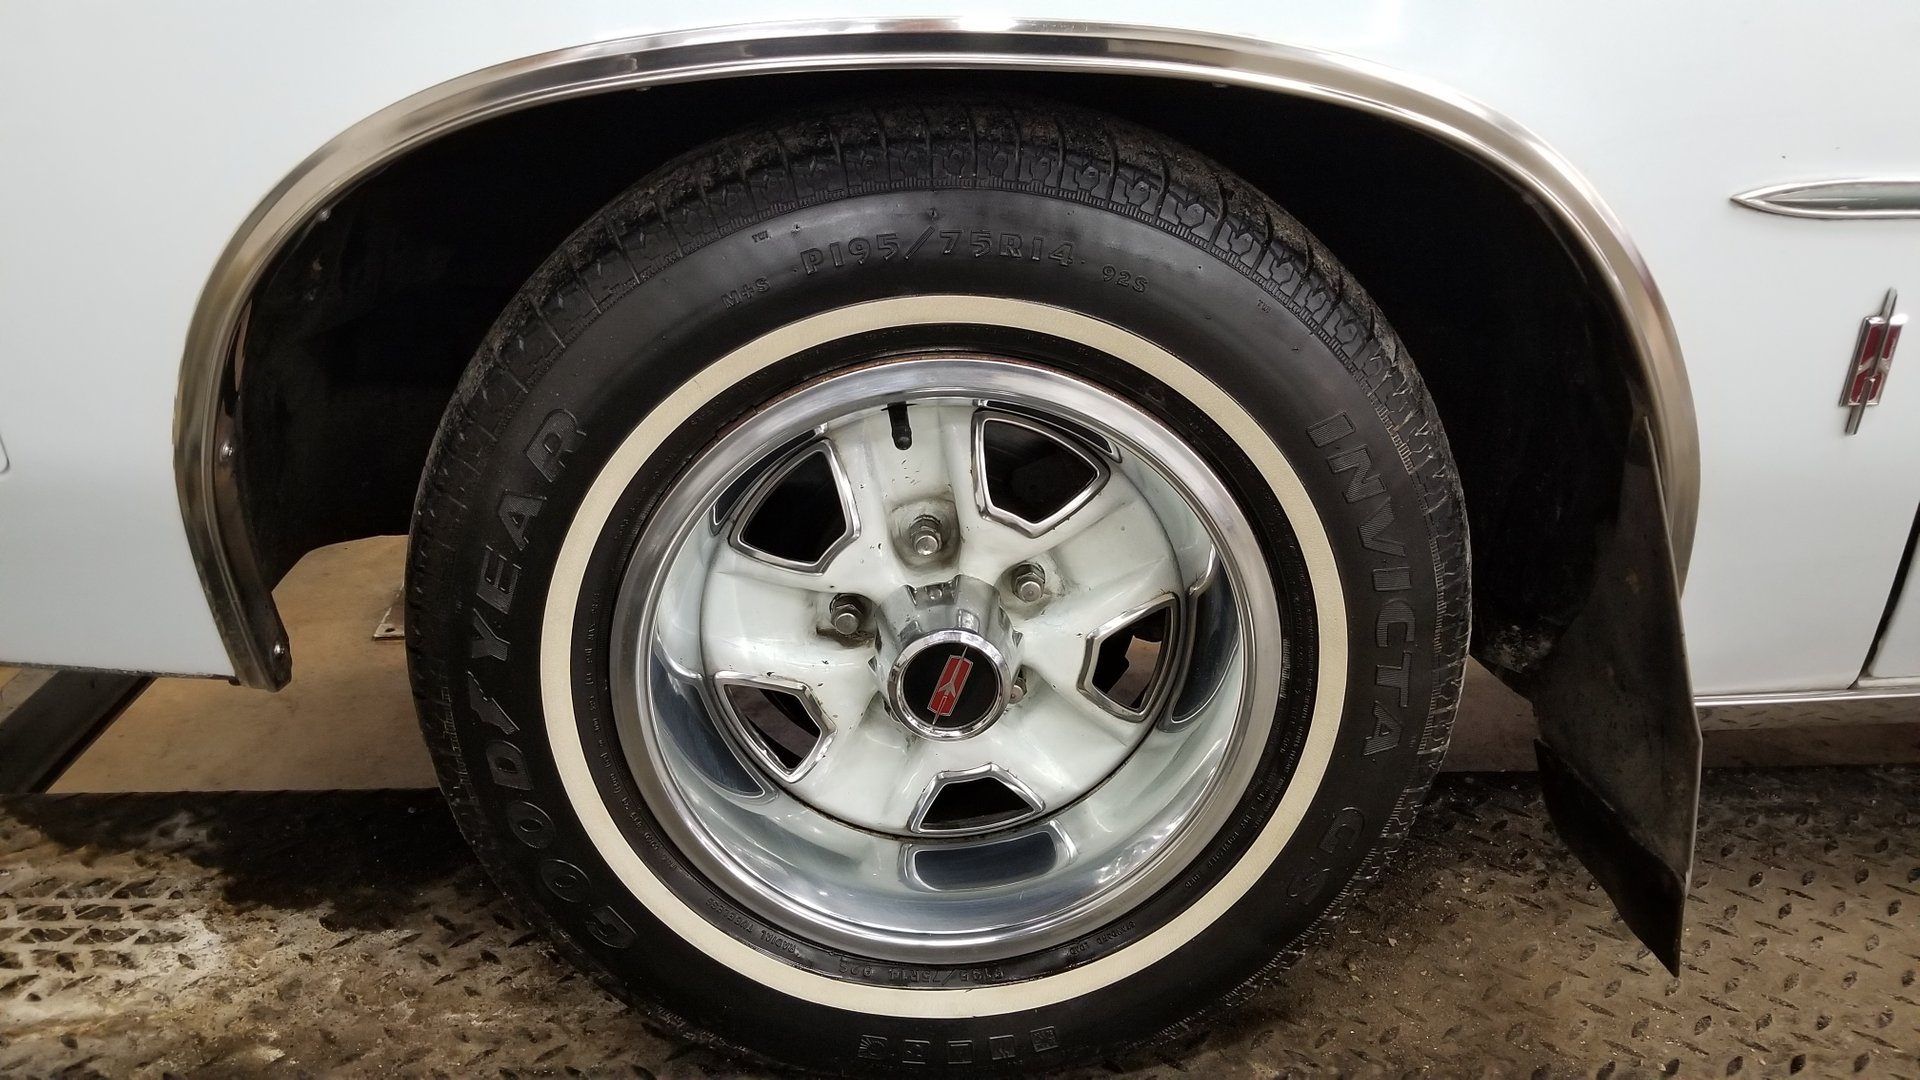 1979 Oldsmobile Cutlass Supreme for sale #118655 | MCG